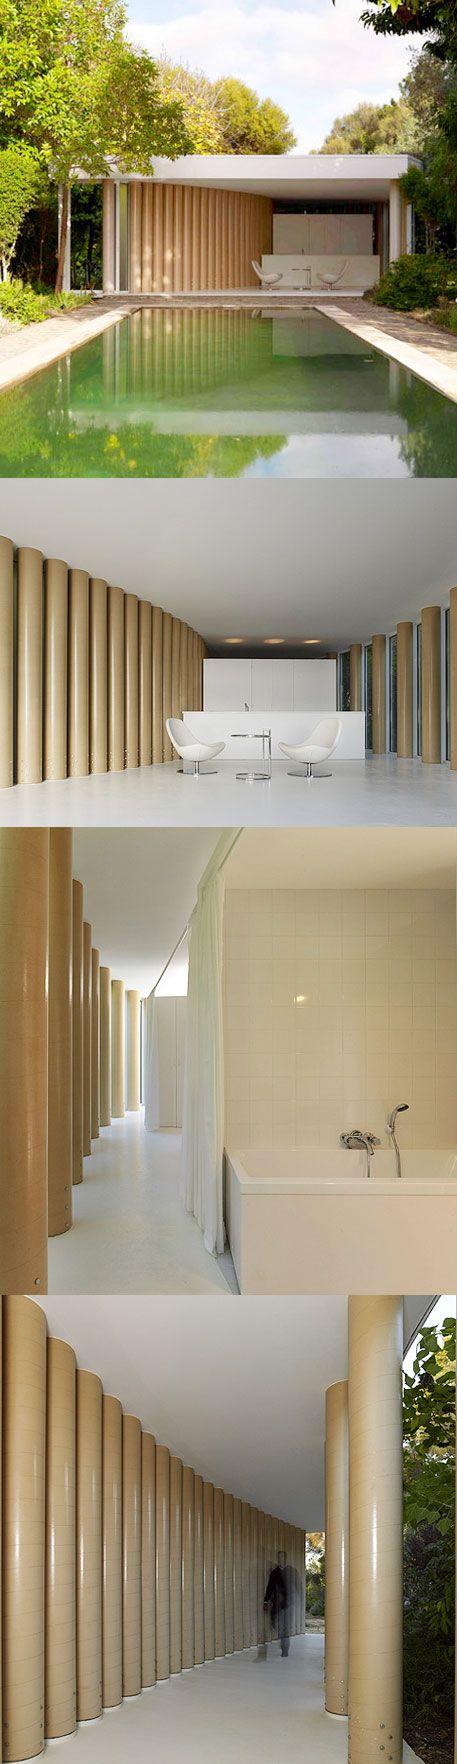 SHIGERU BAN - sonotube colonnade